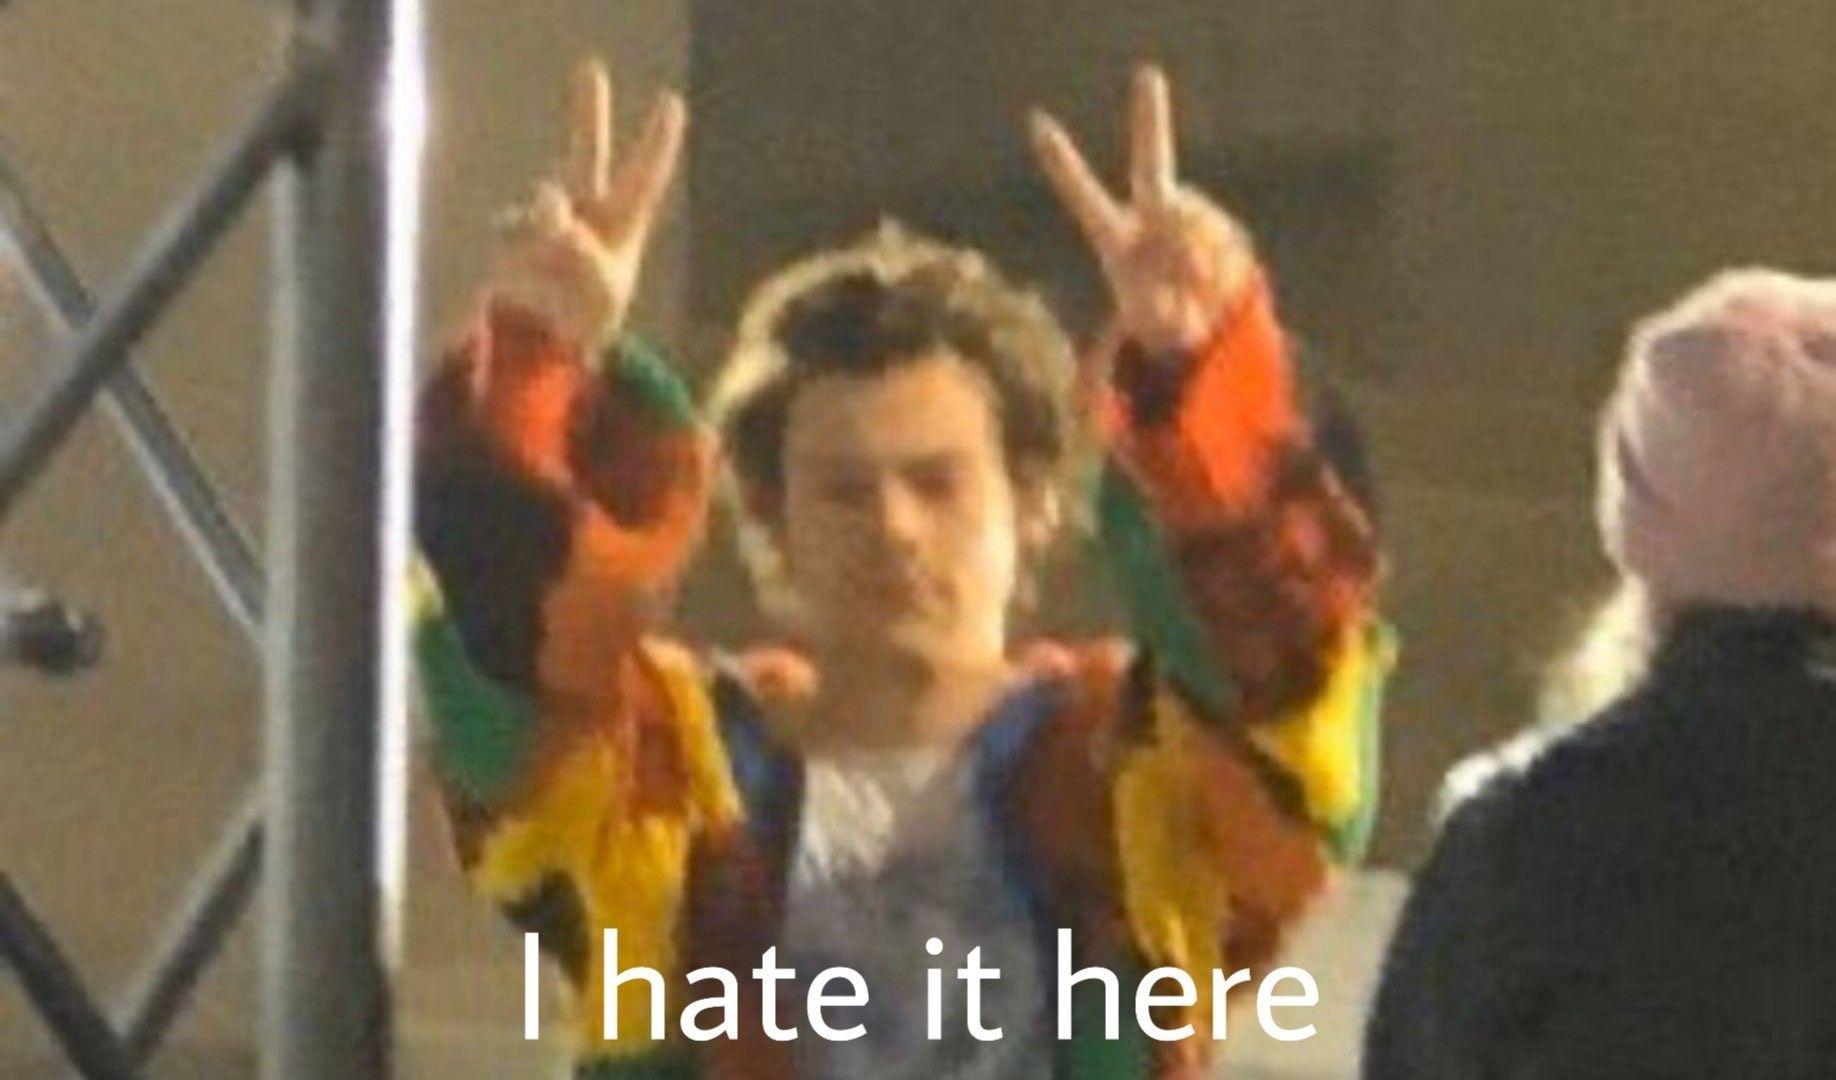 Harry Styles Meme In 2020 One Direction Memes Harry Styles Memes One Direction Humor